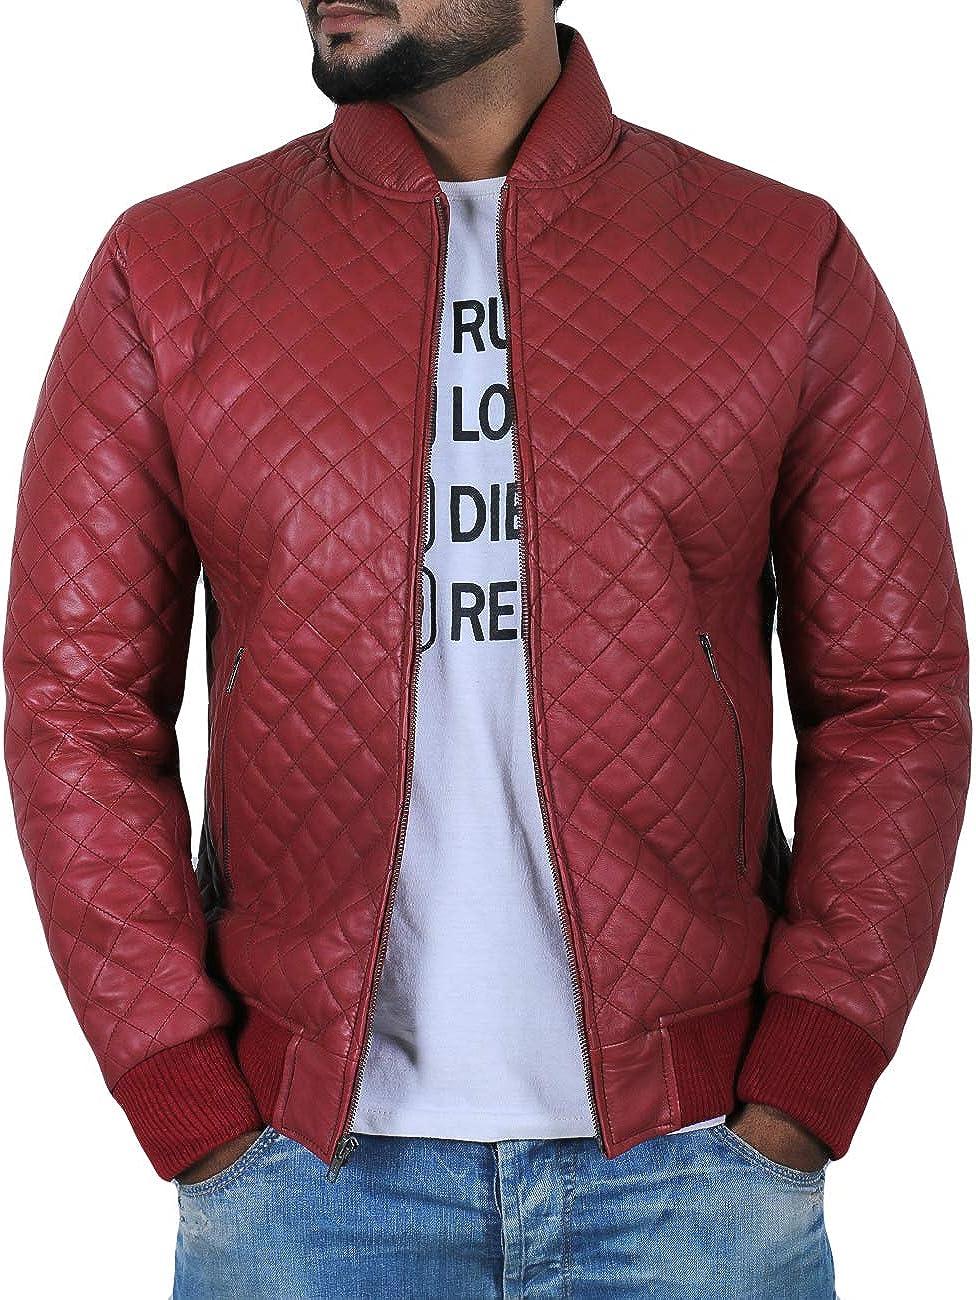 1801006 Black, Bomber Jacket Laverapelle Mens Genuine Lambskin Leather Jacket